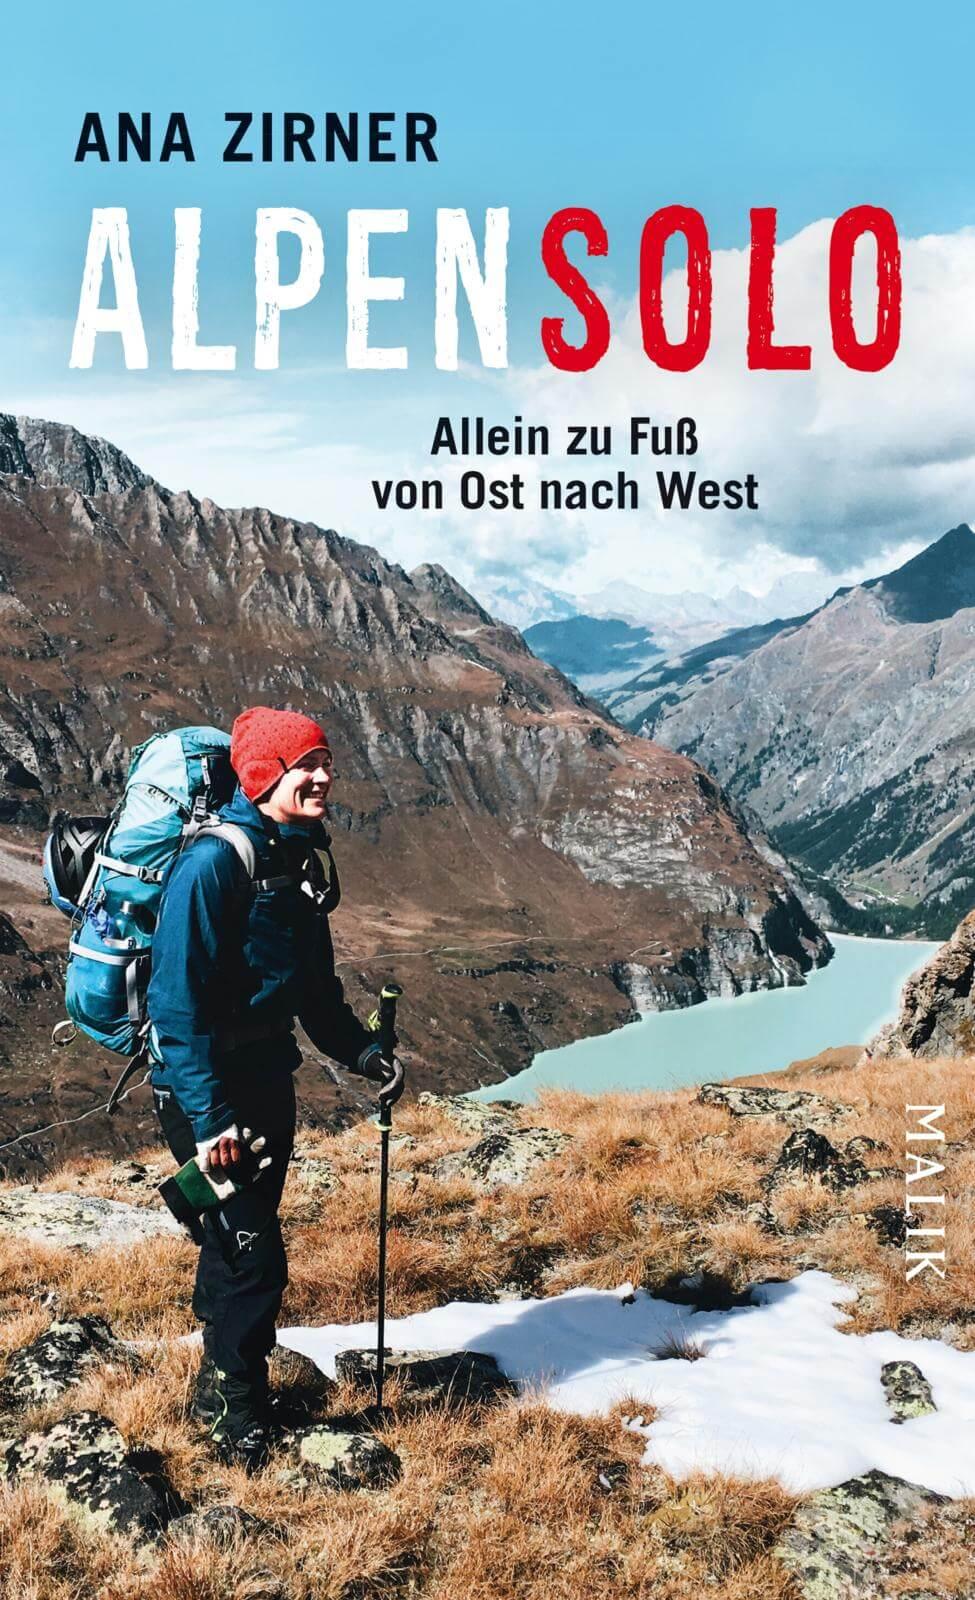 Alpensolo Ana Zirner